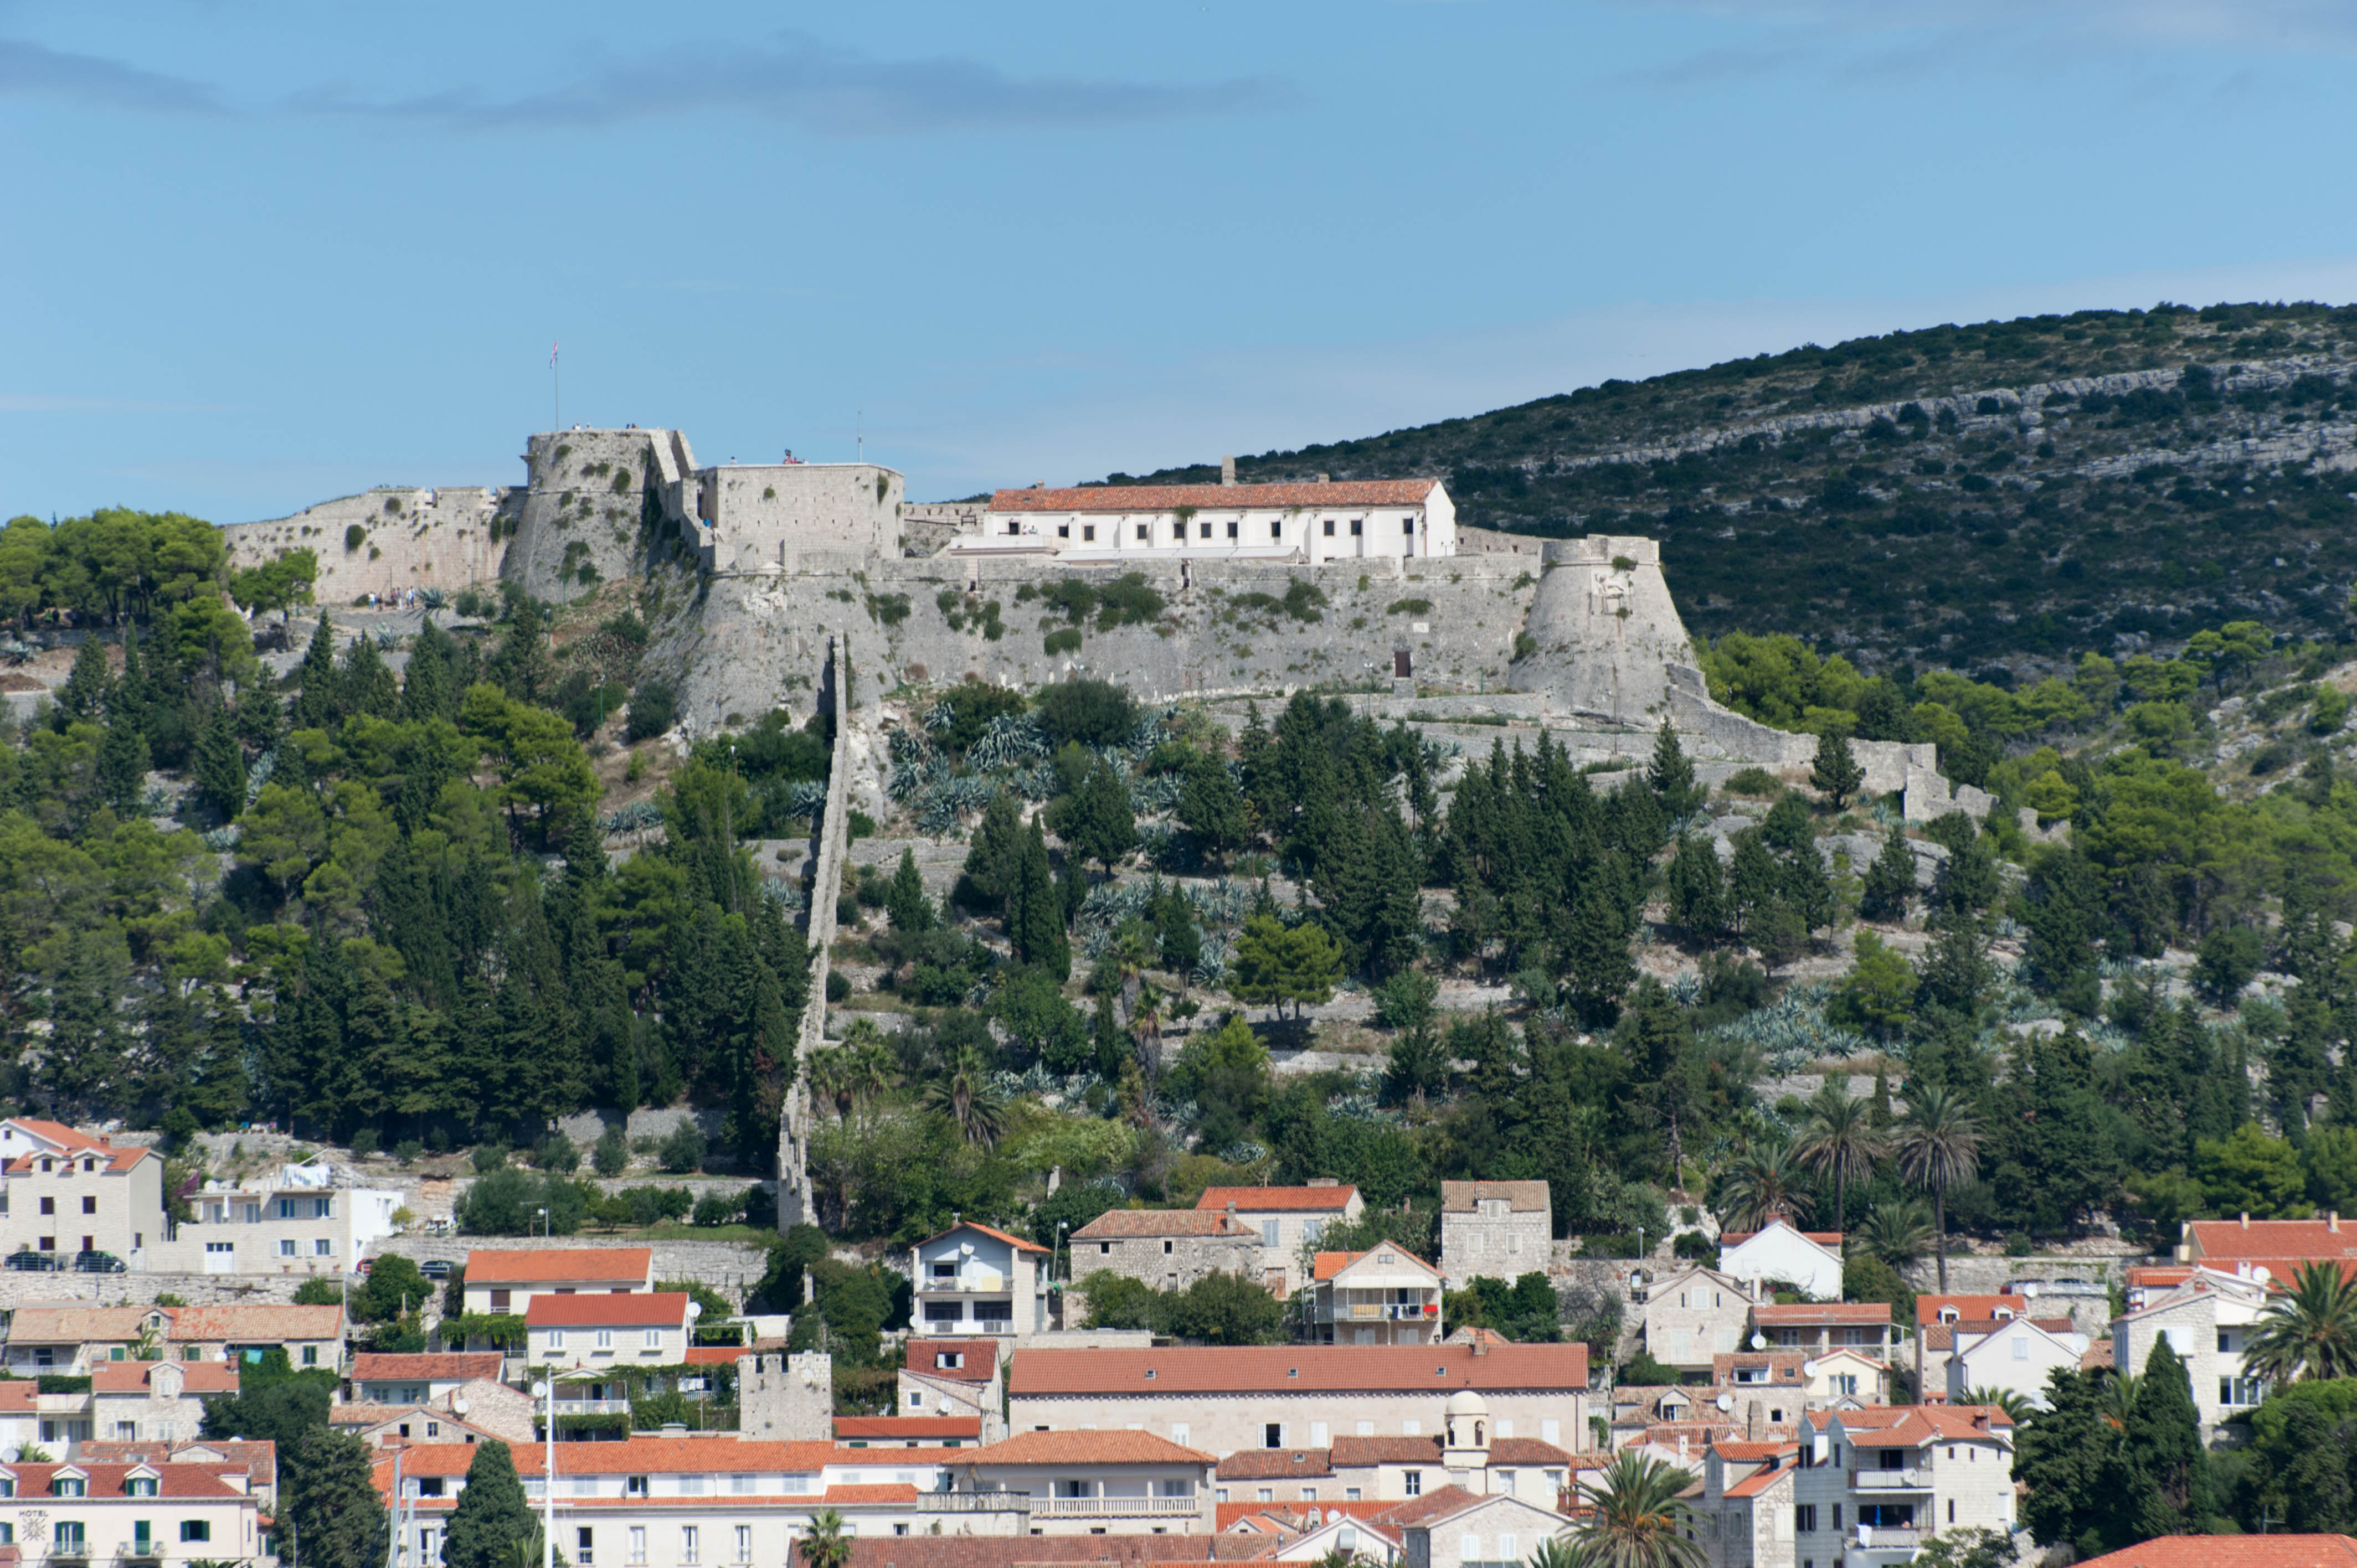 9855-Hvar (Dalmatie centrale)